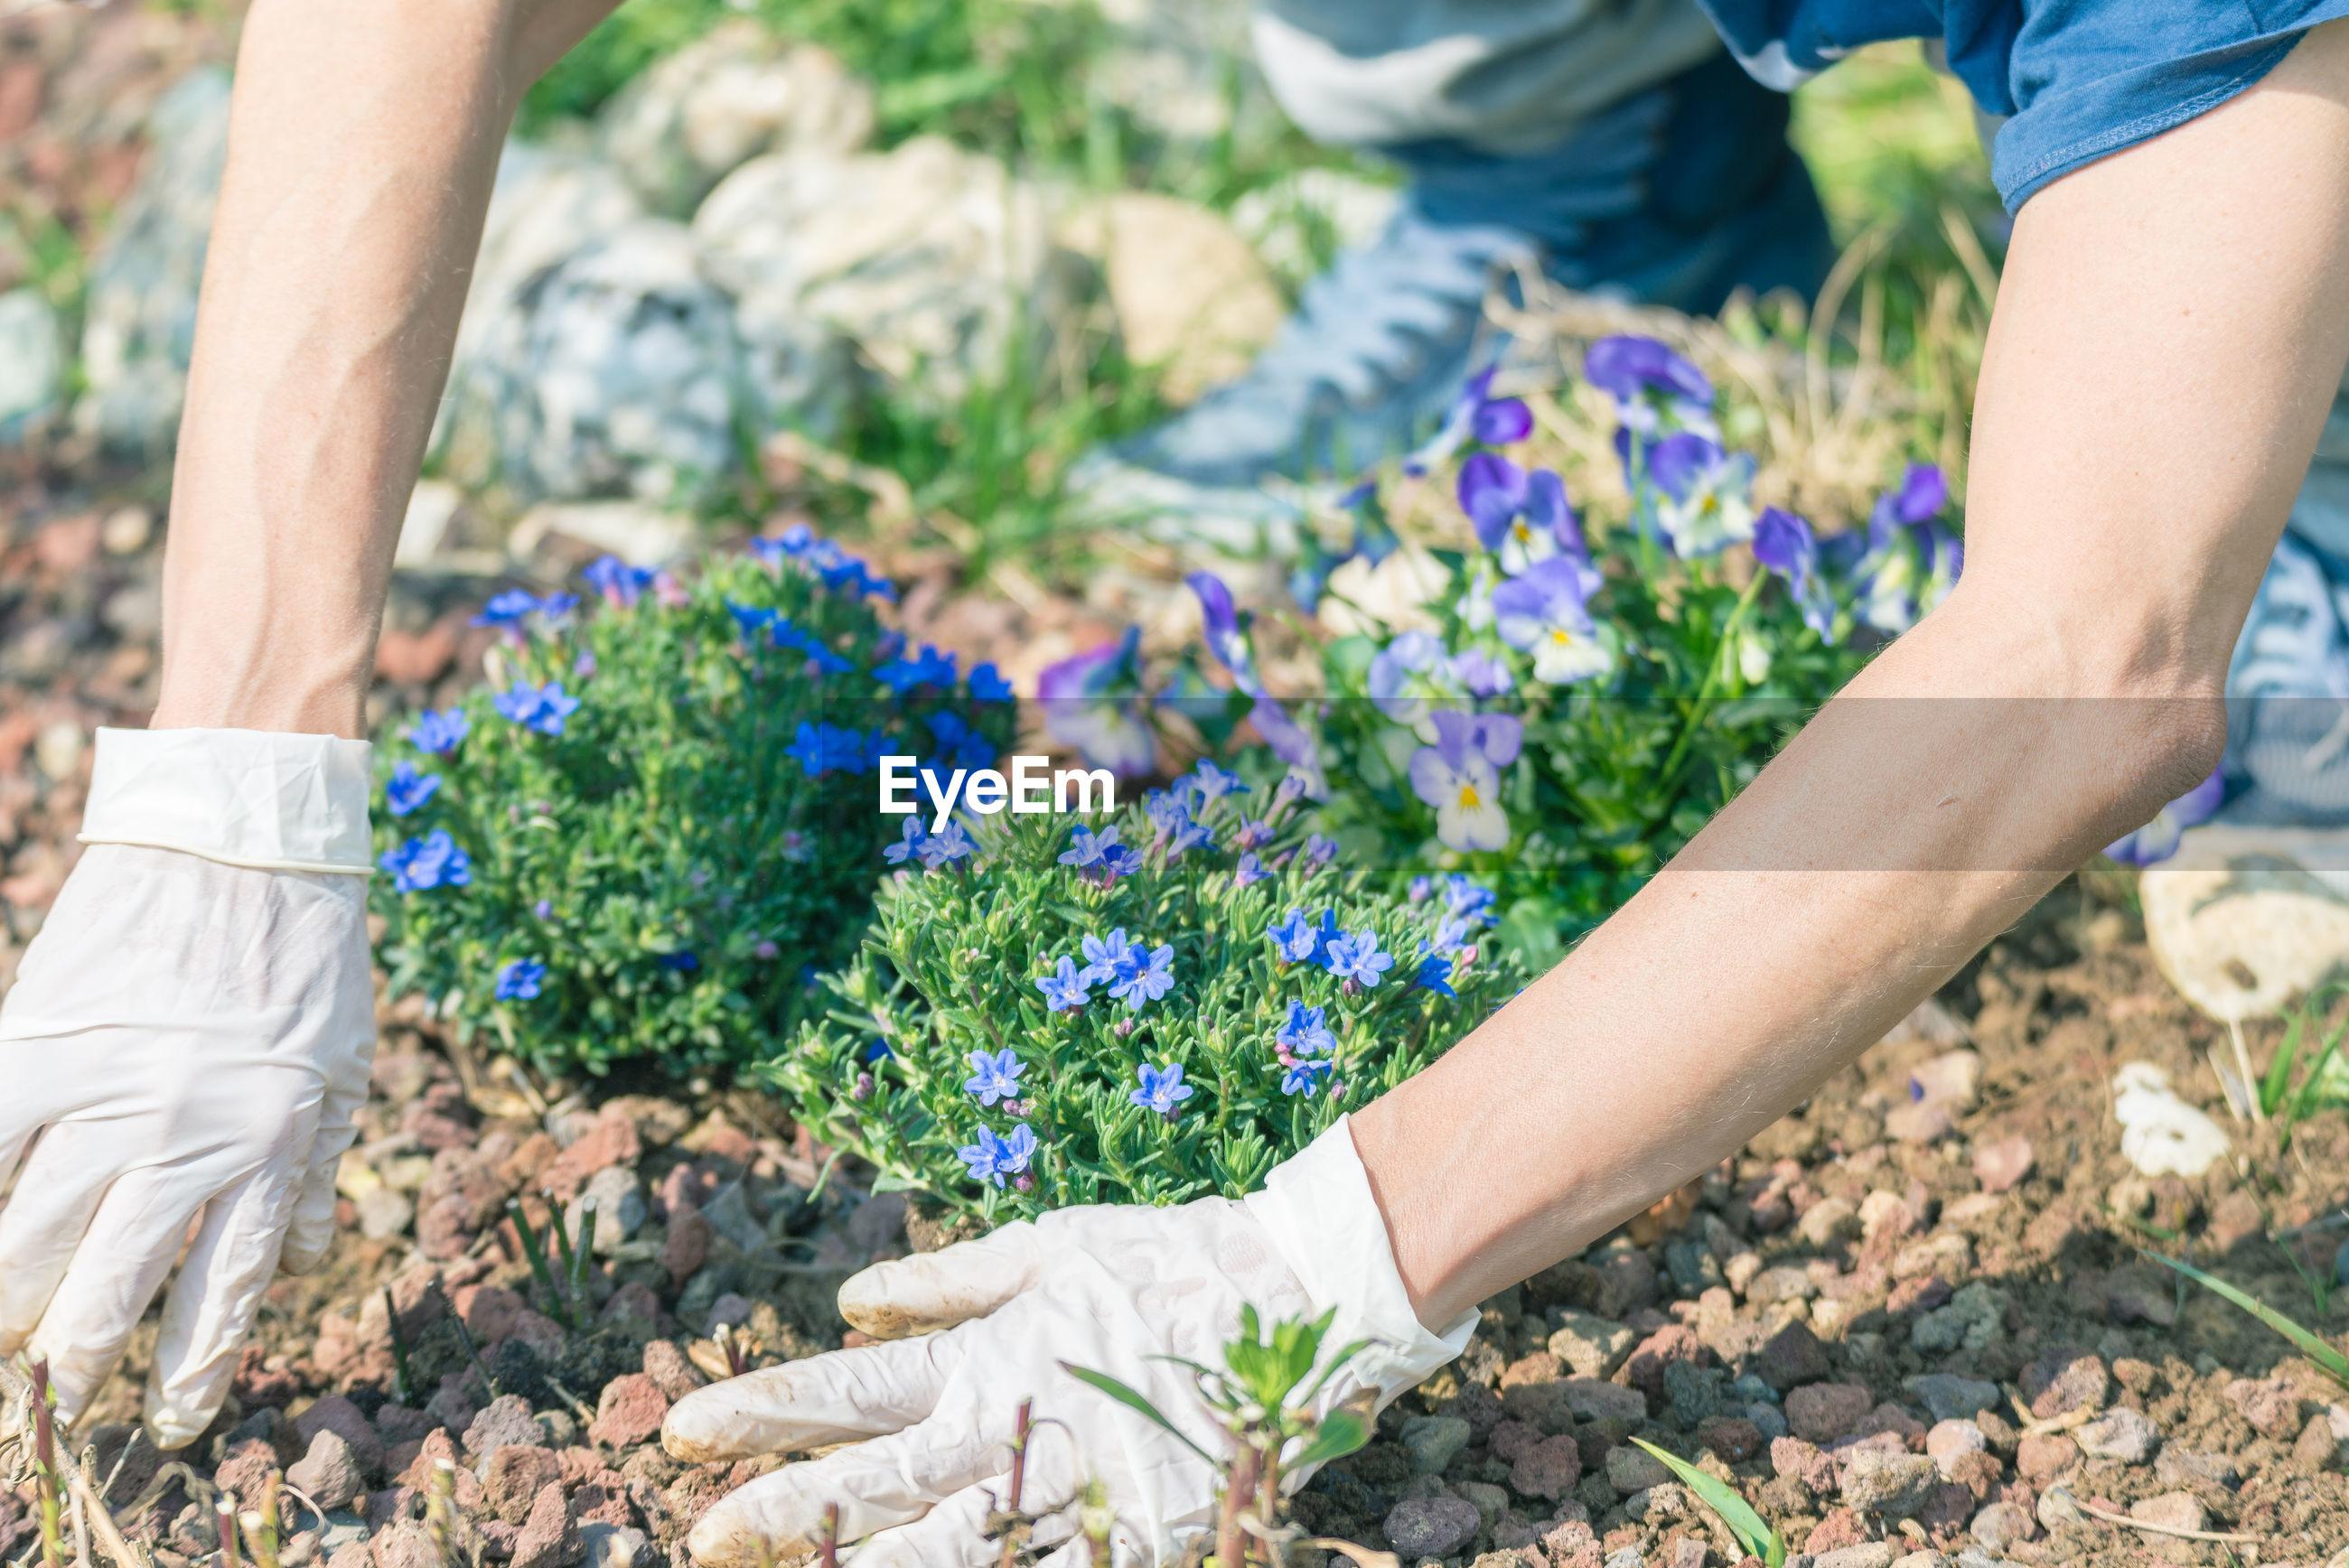 Close-up of woman gardening